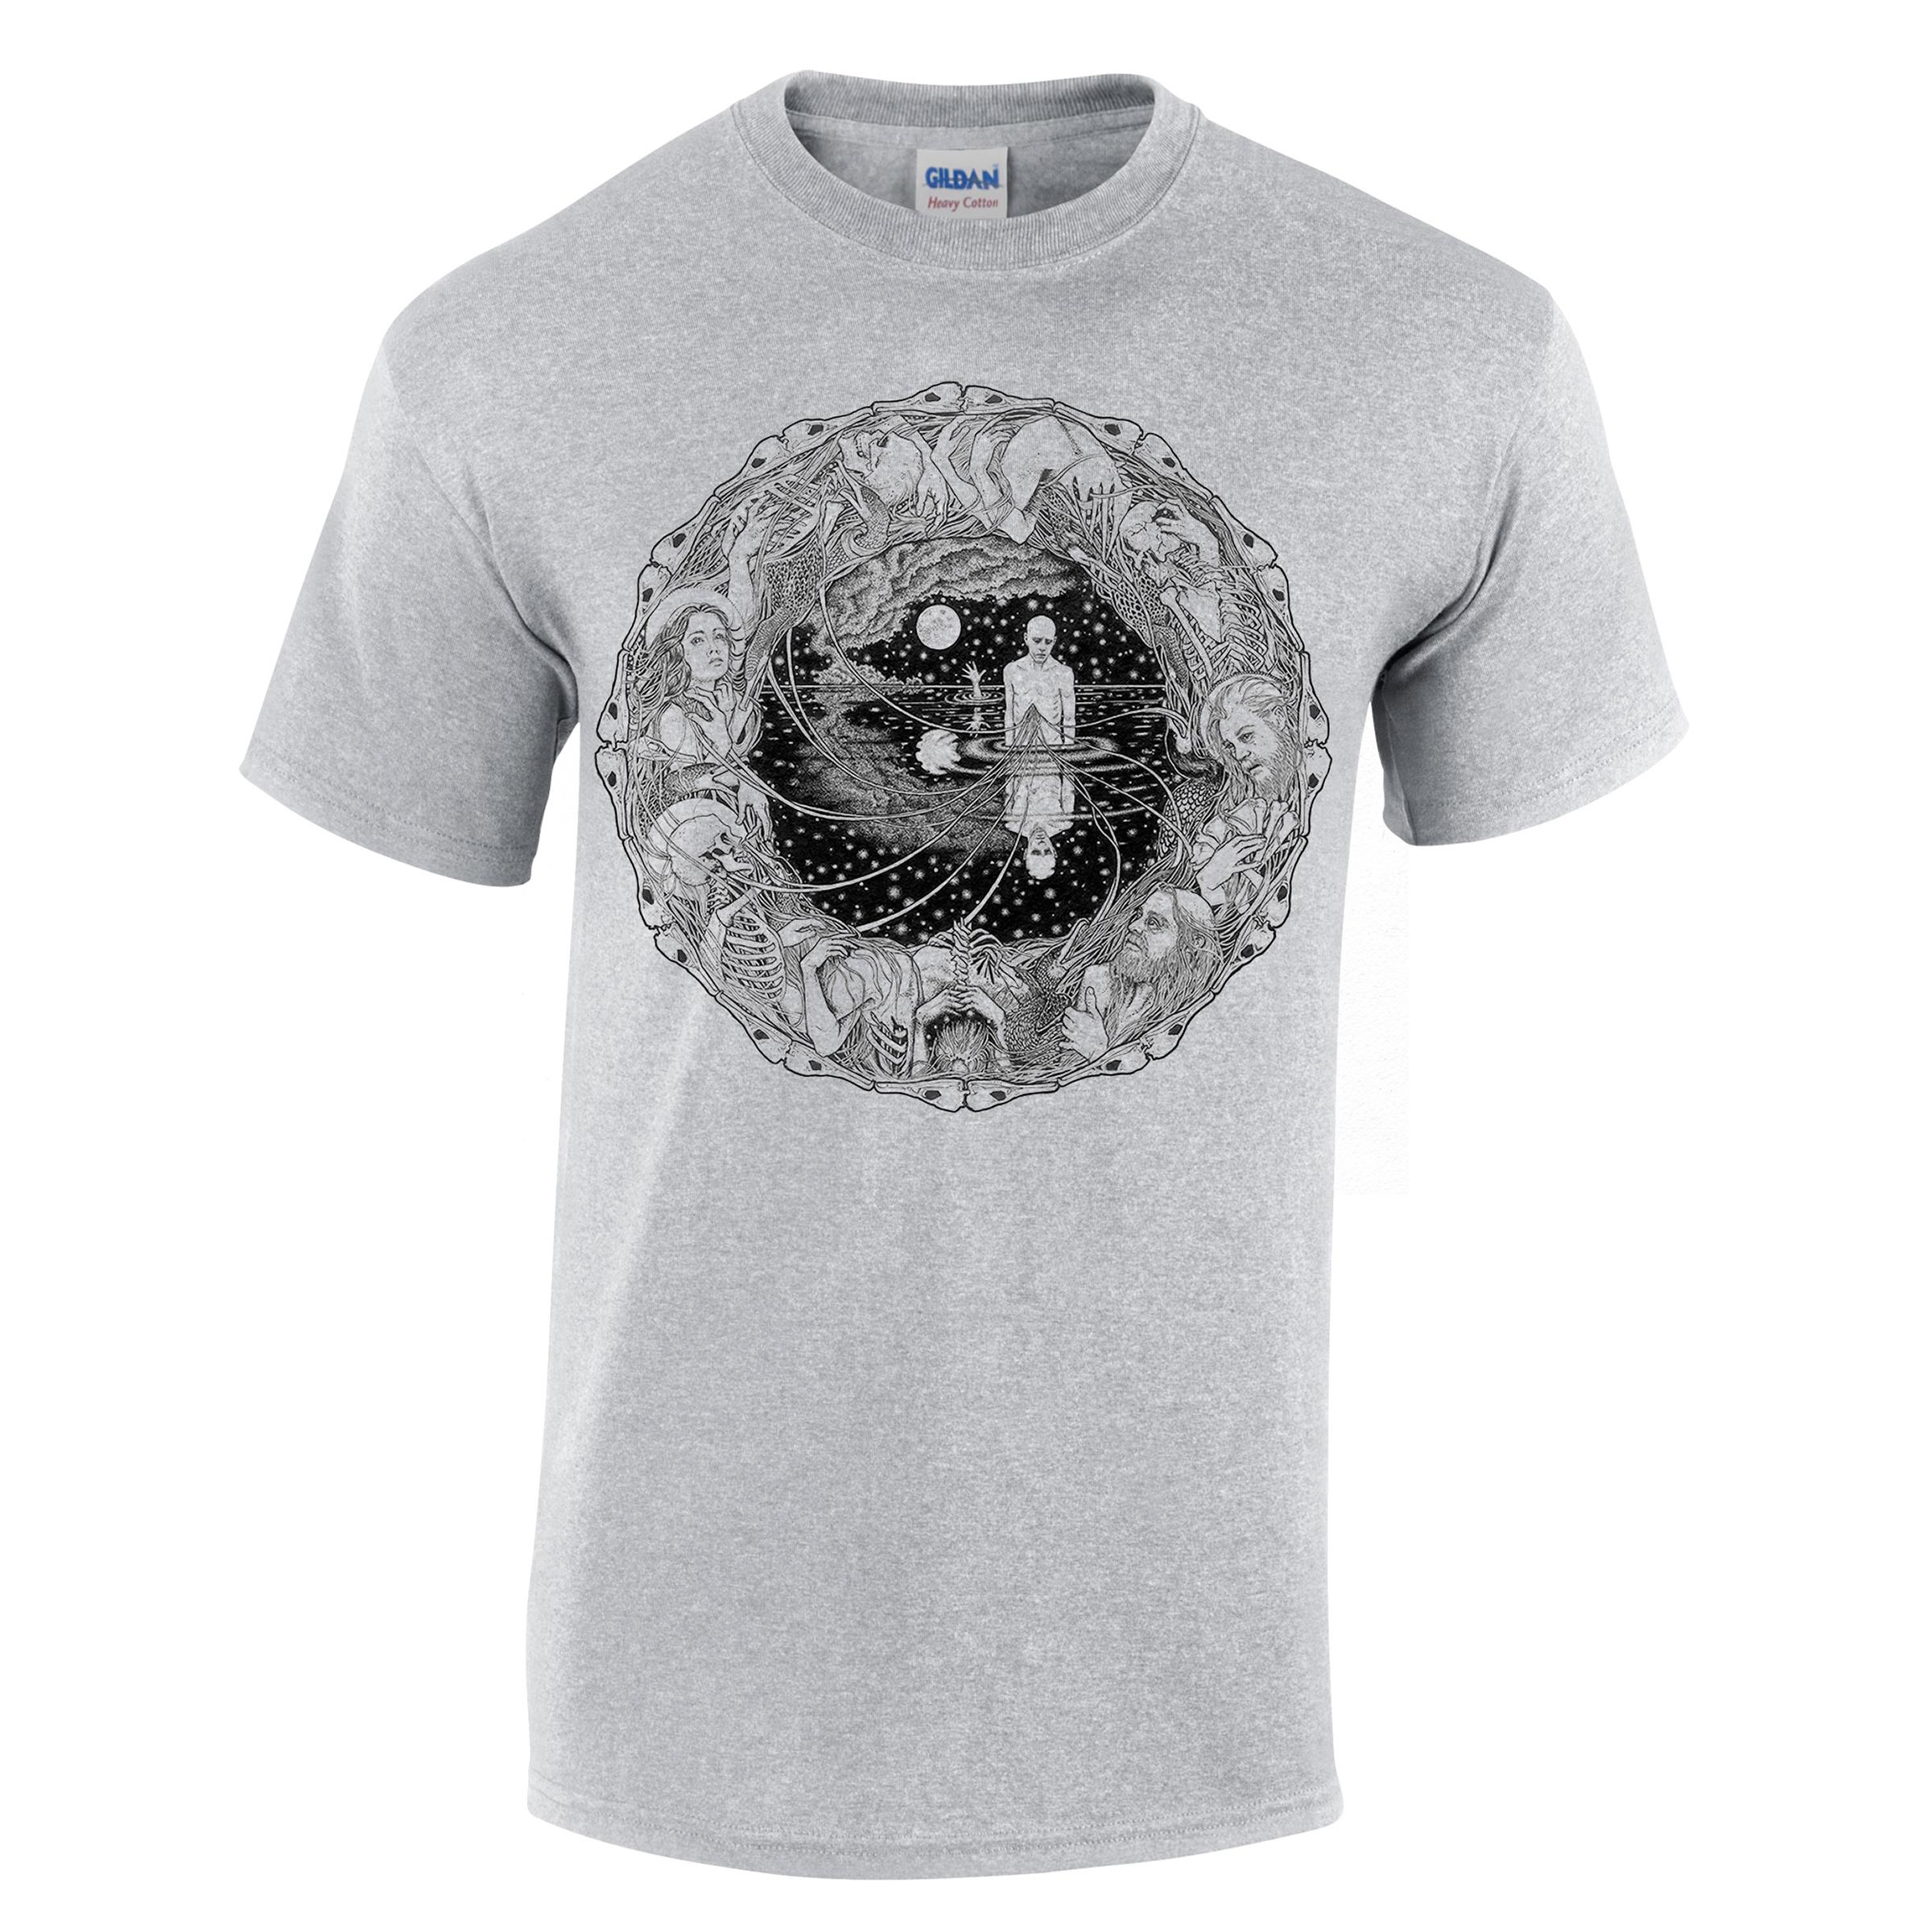 Garganjua - Through The Void shirt